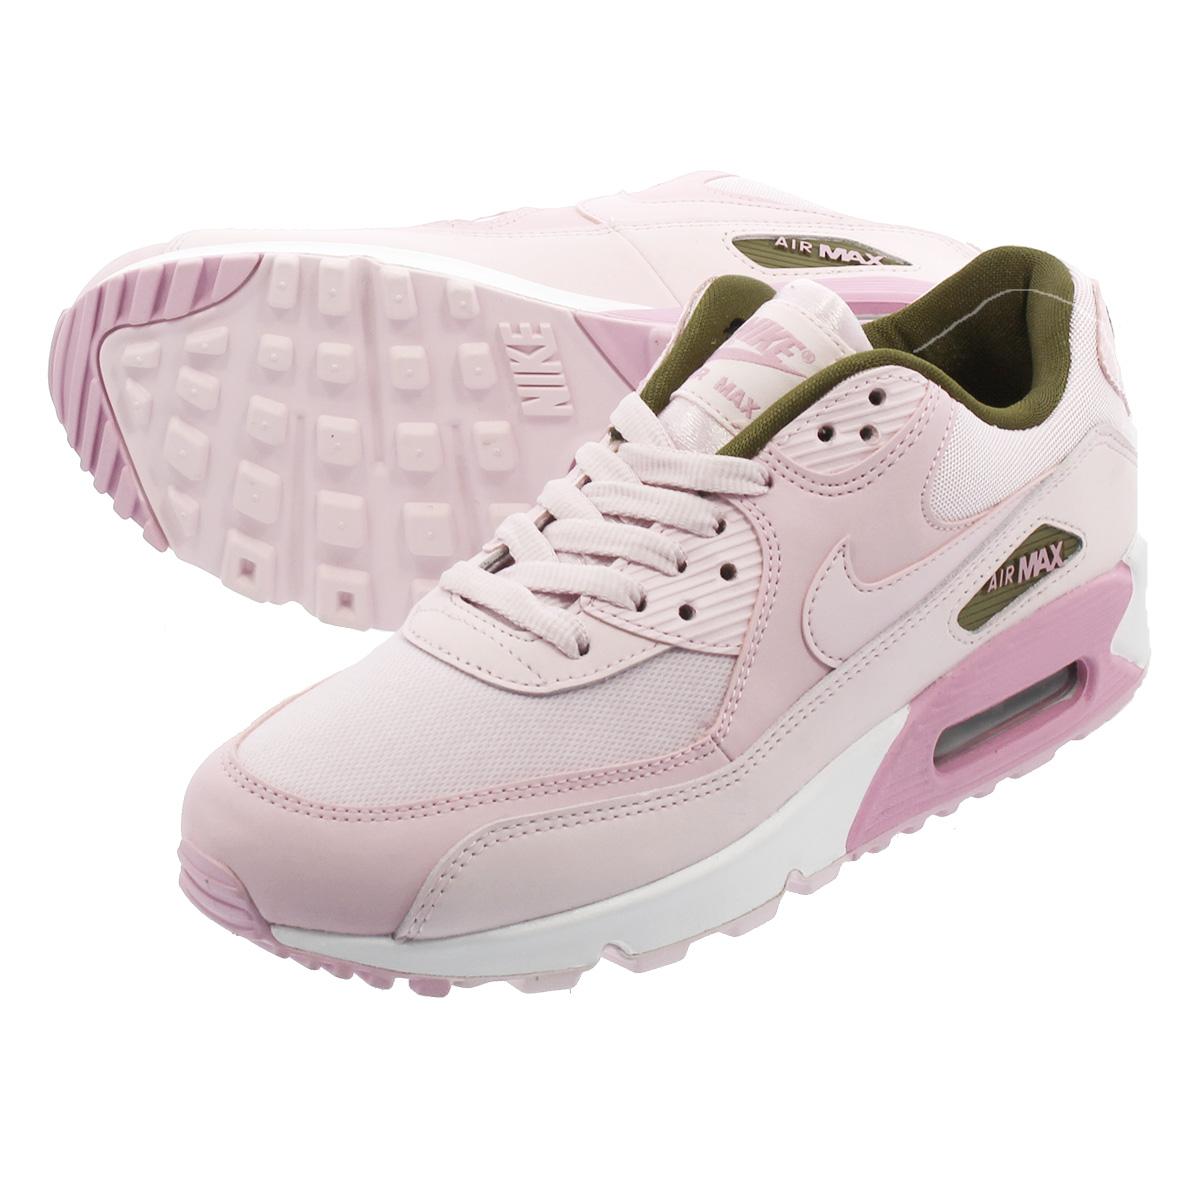 NIKE WMNS AIR MAX 90 SE Nike women Air Max 90 SE PINKWHITE 881,105 605